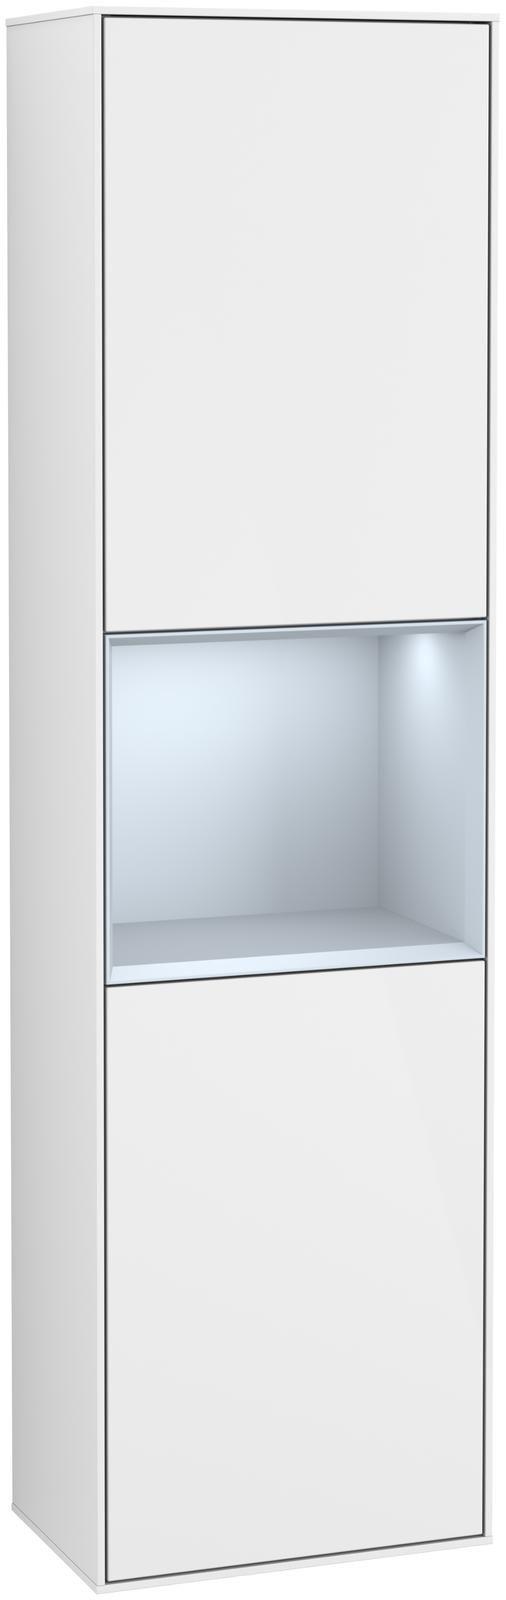 Villeroy & Boch Finion F46 Hochschrank mit Regalelement 2 Türen Anschlag links LED-Beleuchtung B:41,8xH:151,6xT:27cm Front, Korpus: Glossy White Lack, Regal: Cloud F460HAGF